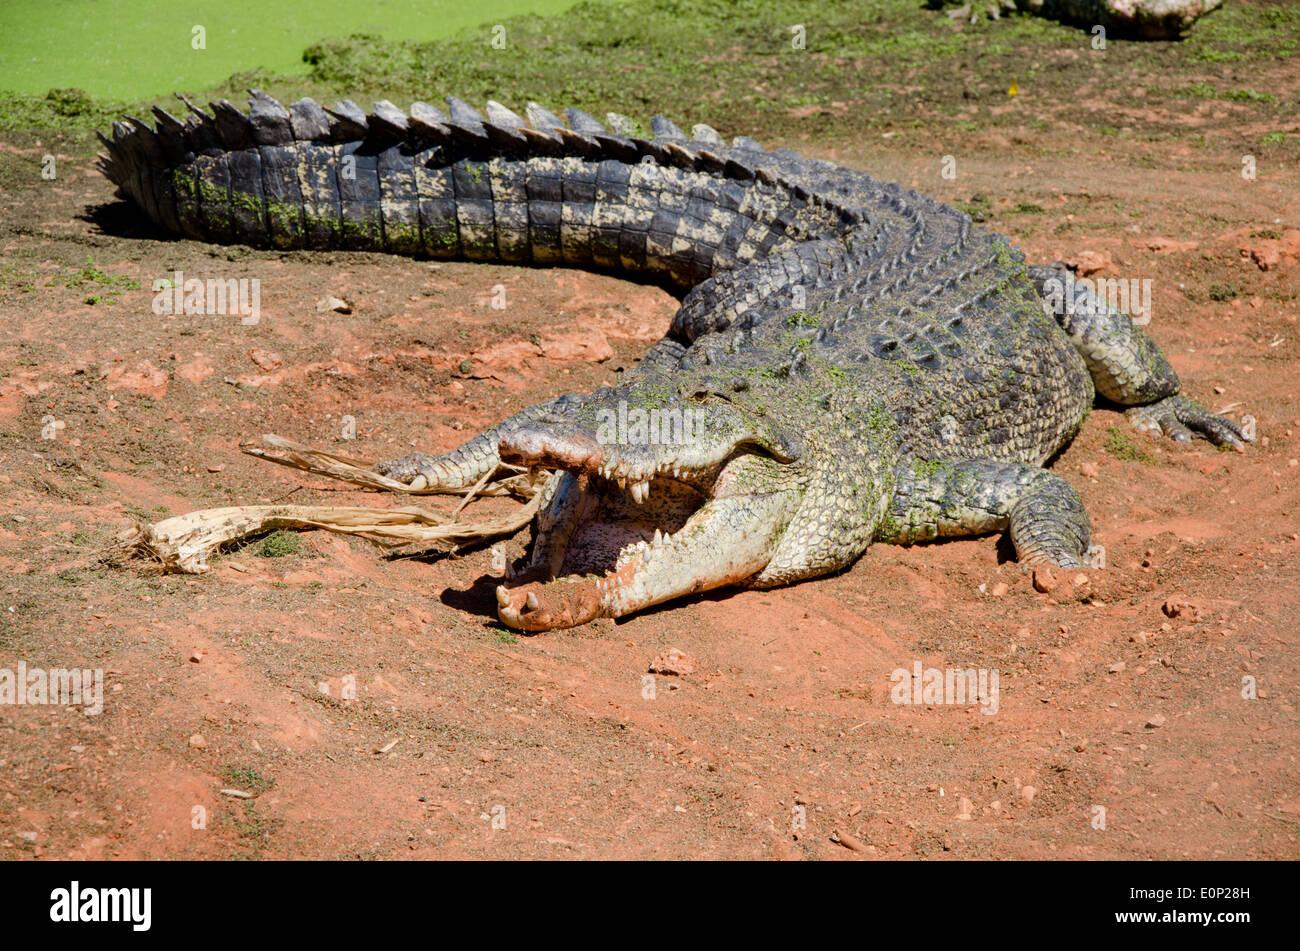 Australia, Western Australia, Broome. Malcolm Douglas Crocodile Park. Large saltwater crocodile. - Stock Image